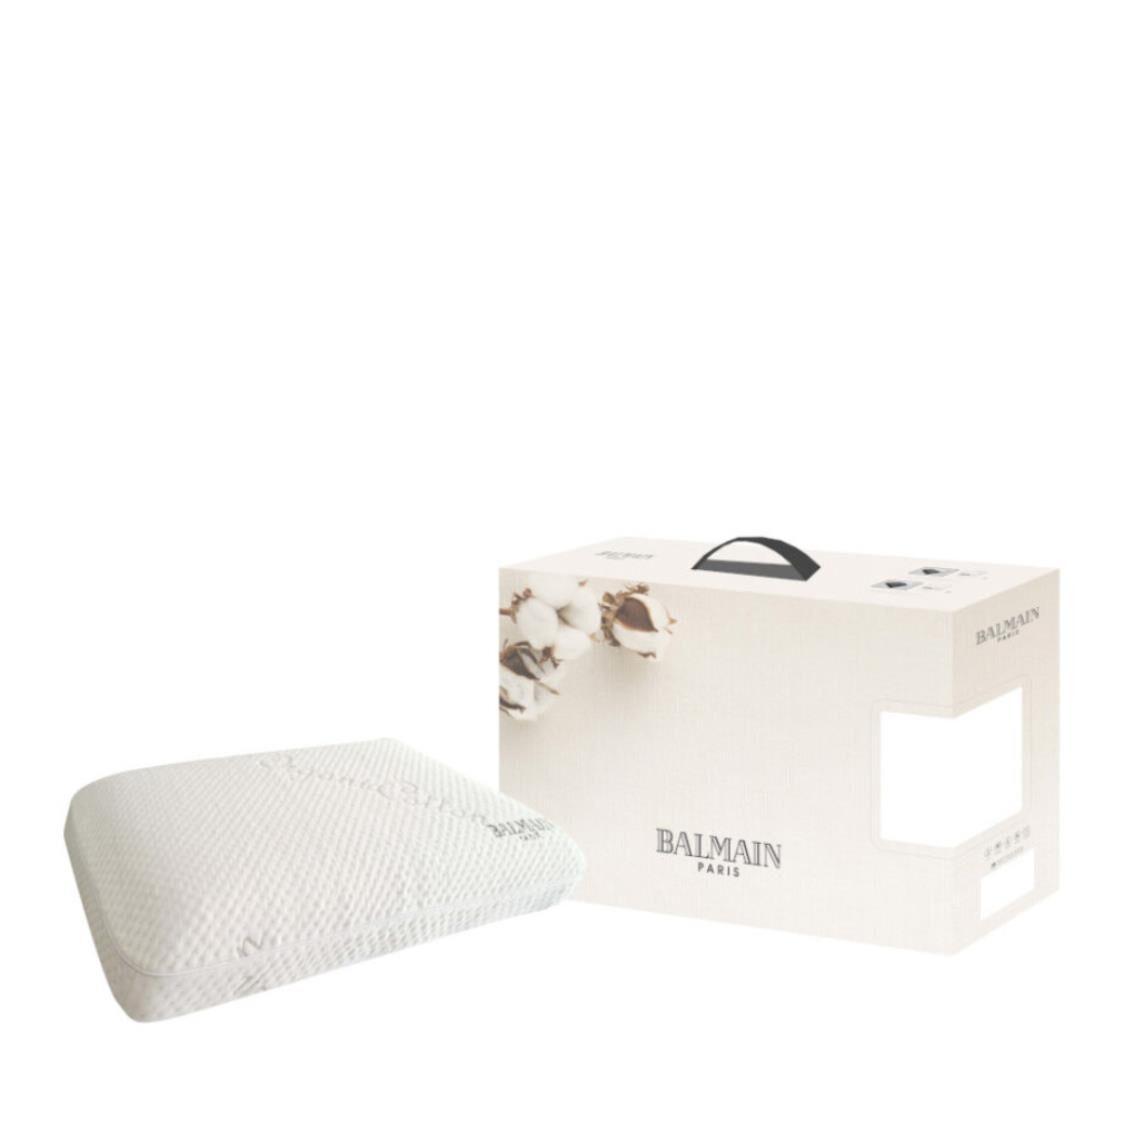 Balmain Organic Cotton Memory Foam Pillow - Comfort